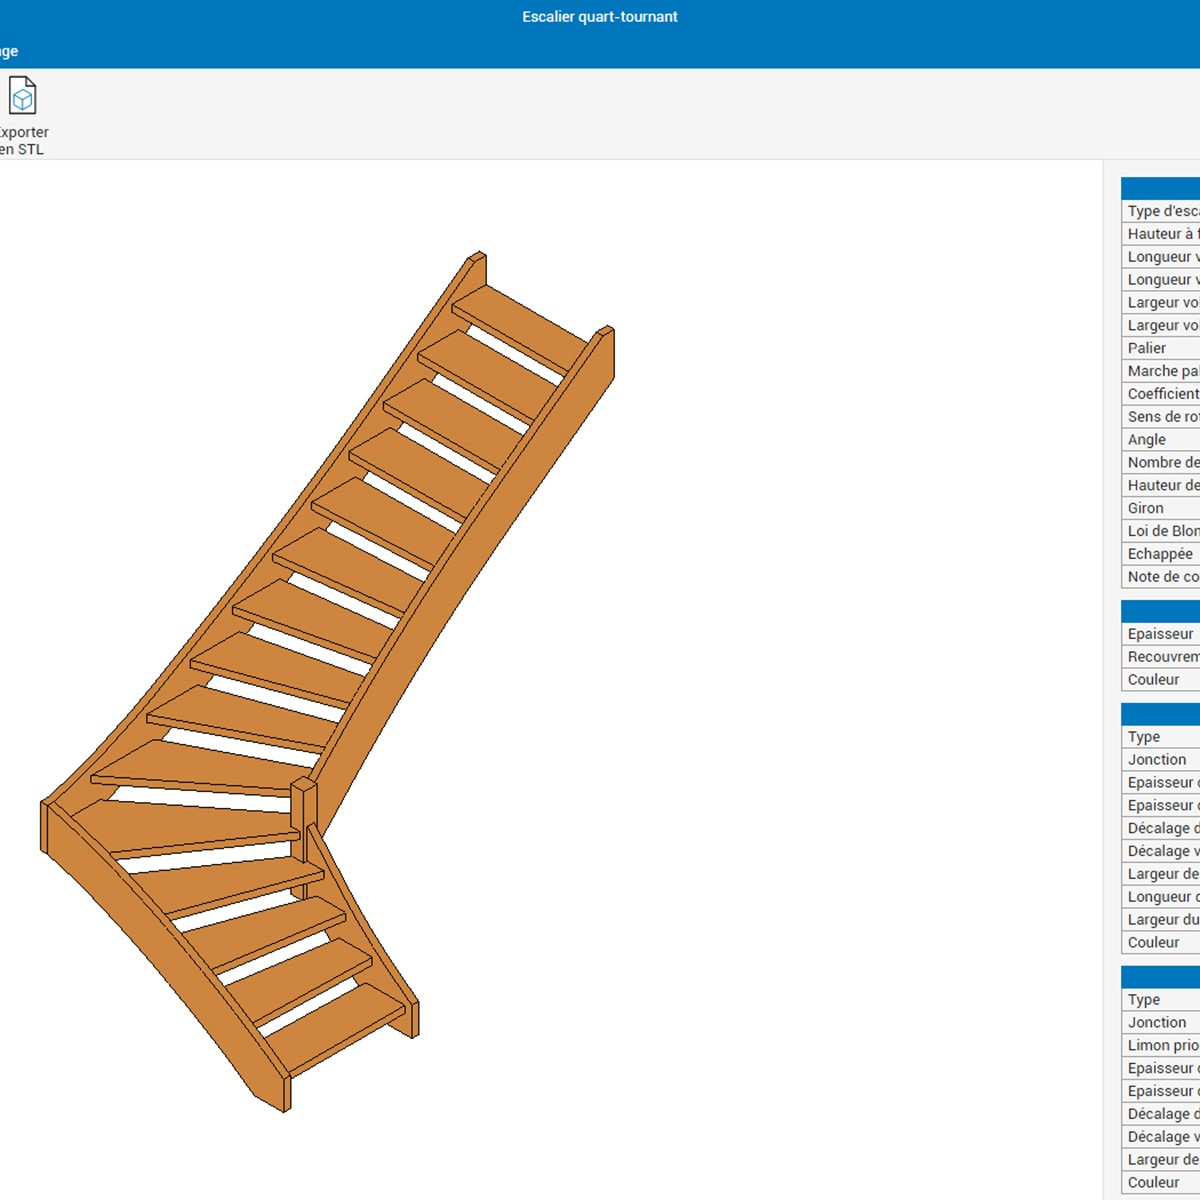 Largeur D Une Marche D Escalier autostair alternatives and similar websites and apps